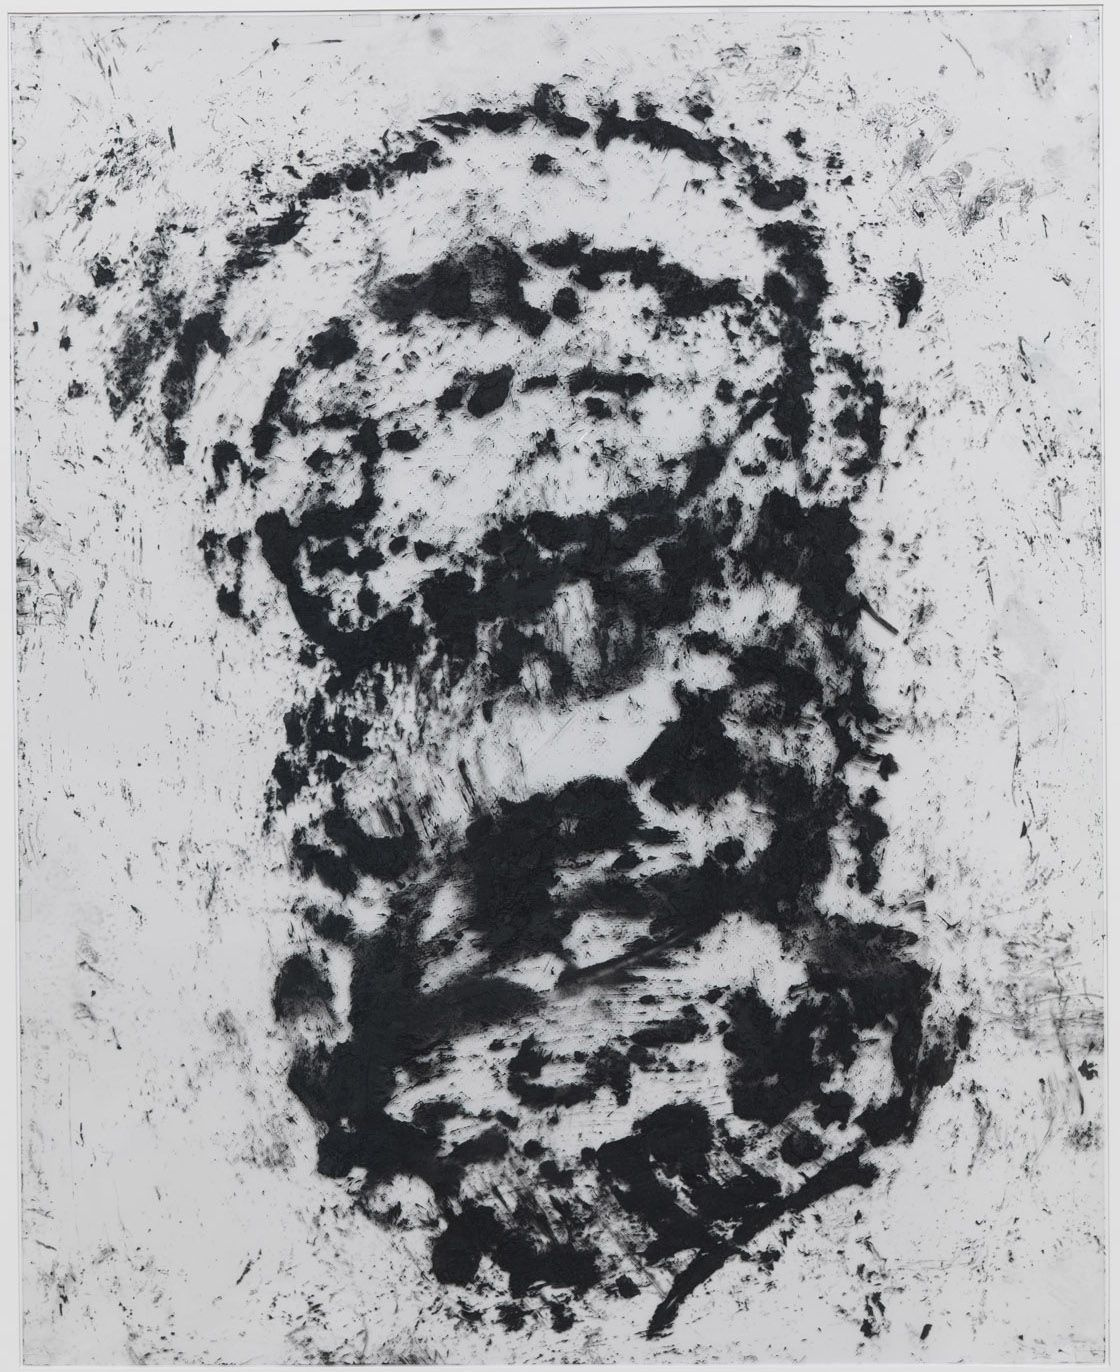 Richard Serra,Transparency #18, 2012.